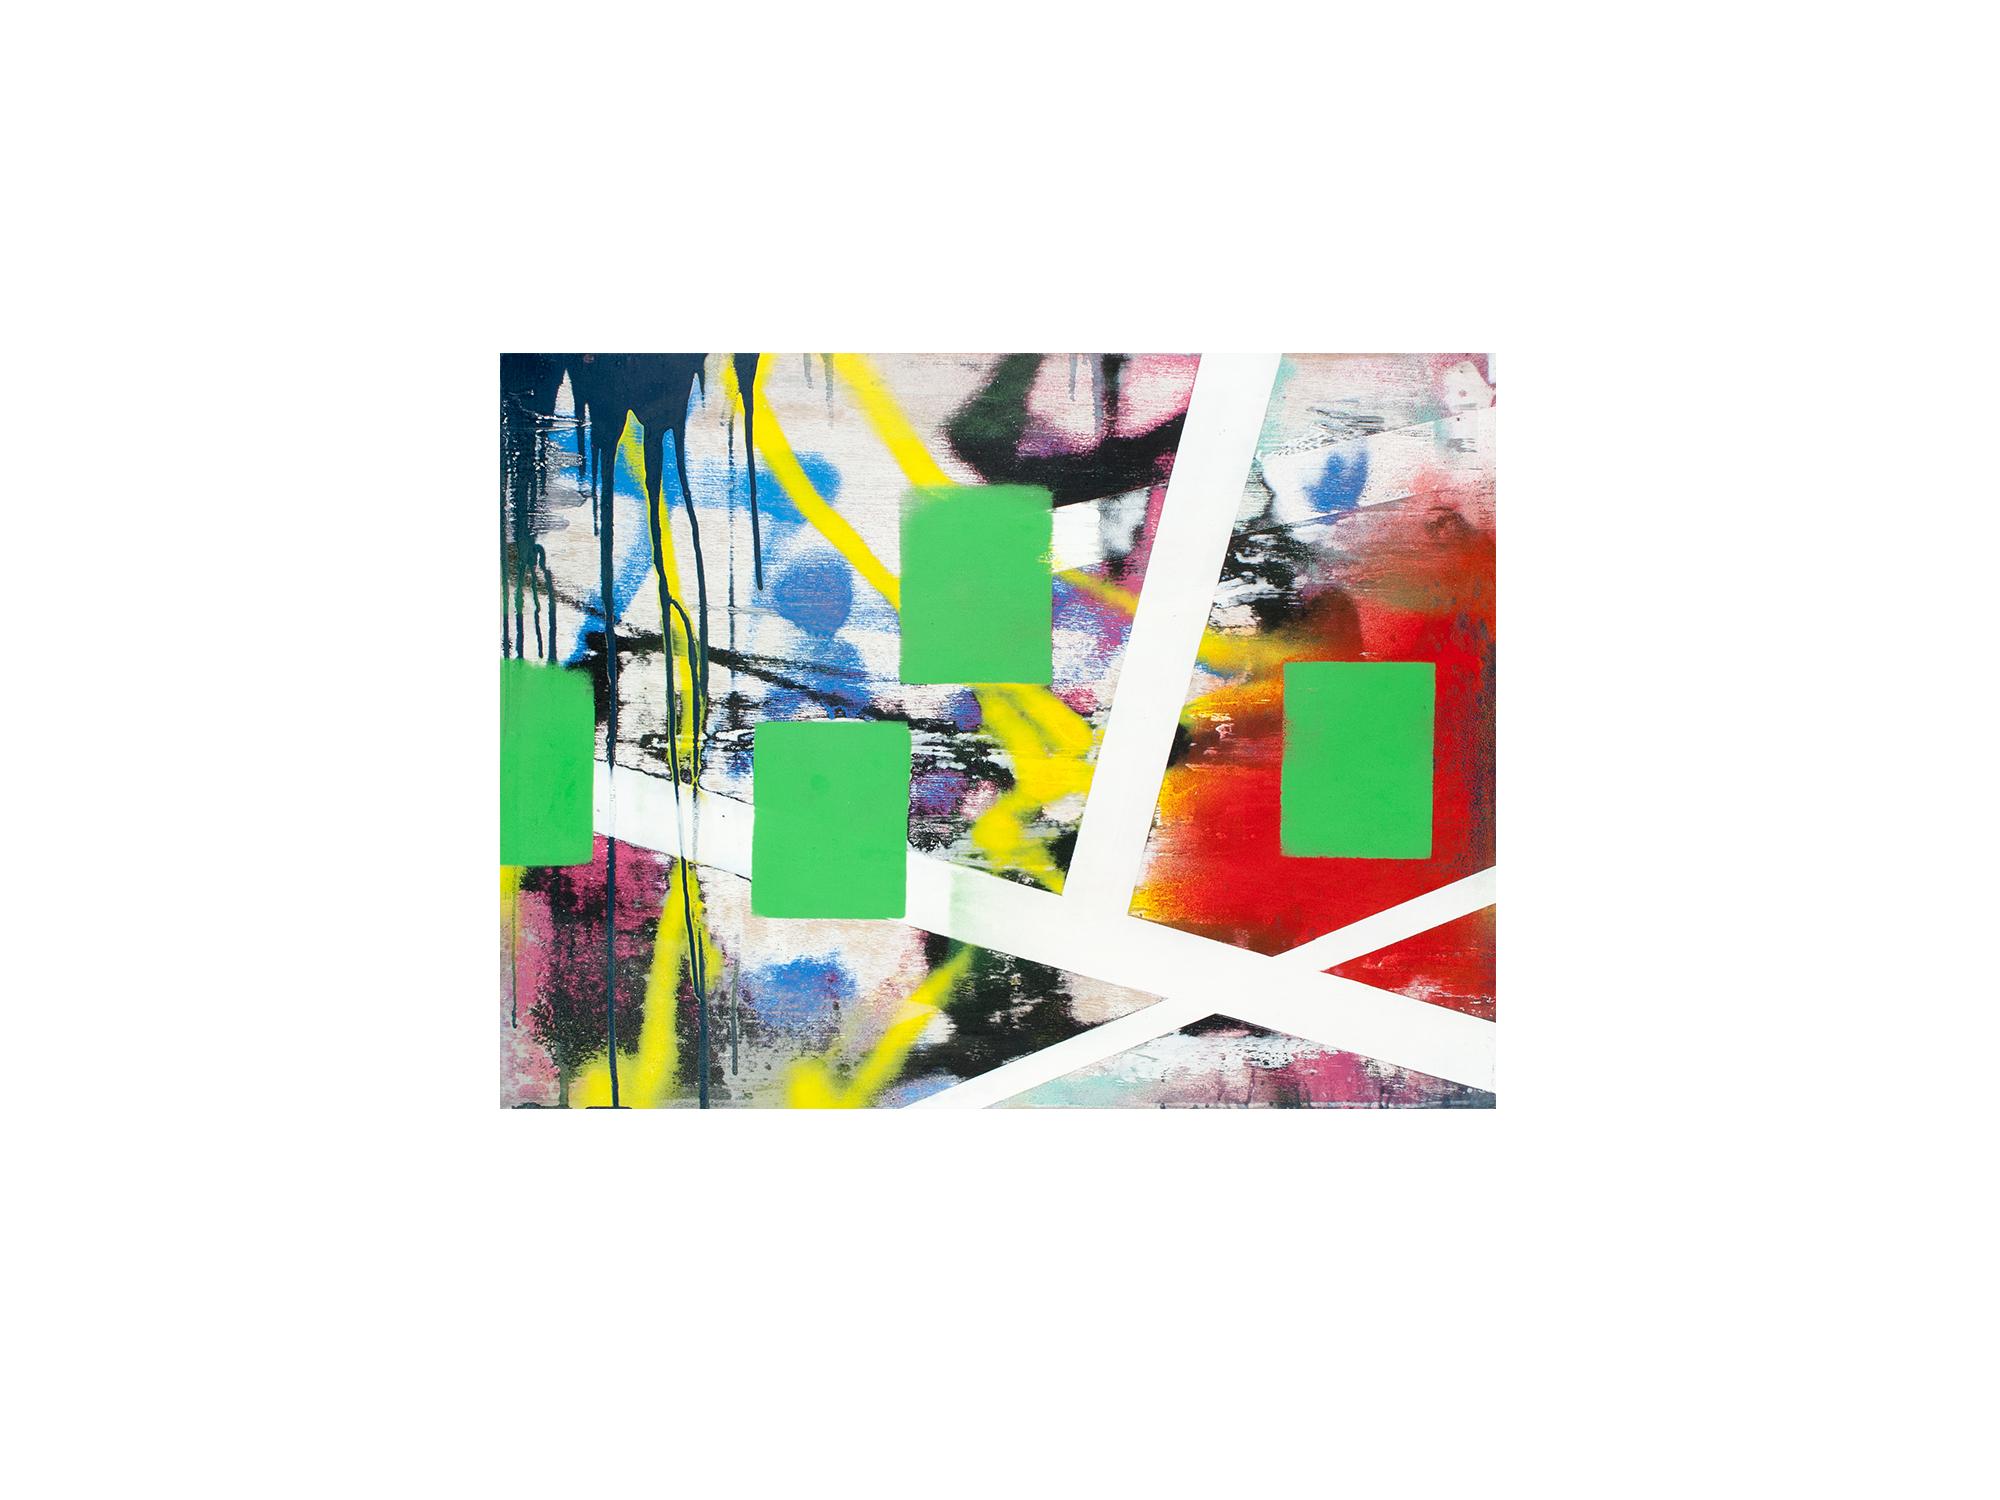 Brett McMahon   KL City 8 , 2017 acrylic and enamel on ply panel 60 x 80cm   ARTIST BIO